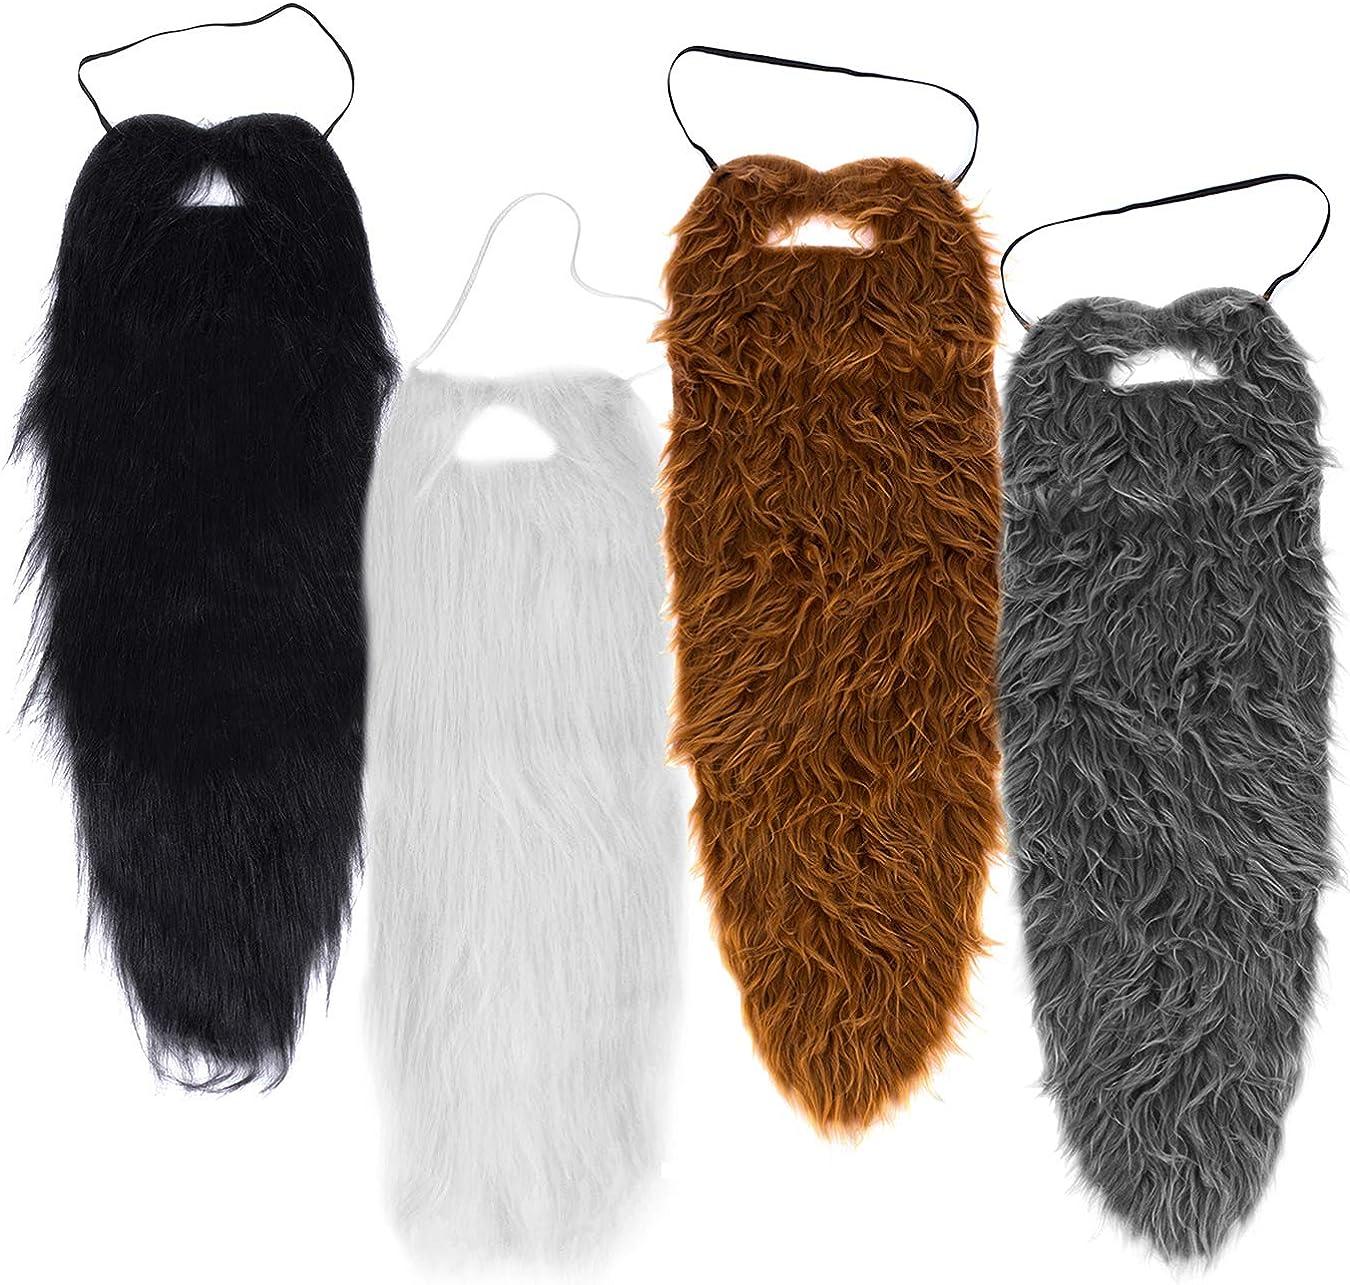 Long Faux Costume Beard and Mustache Set